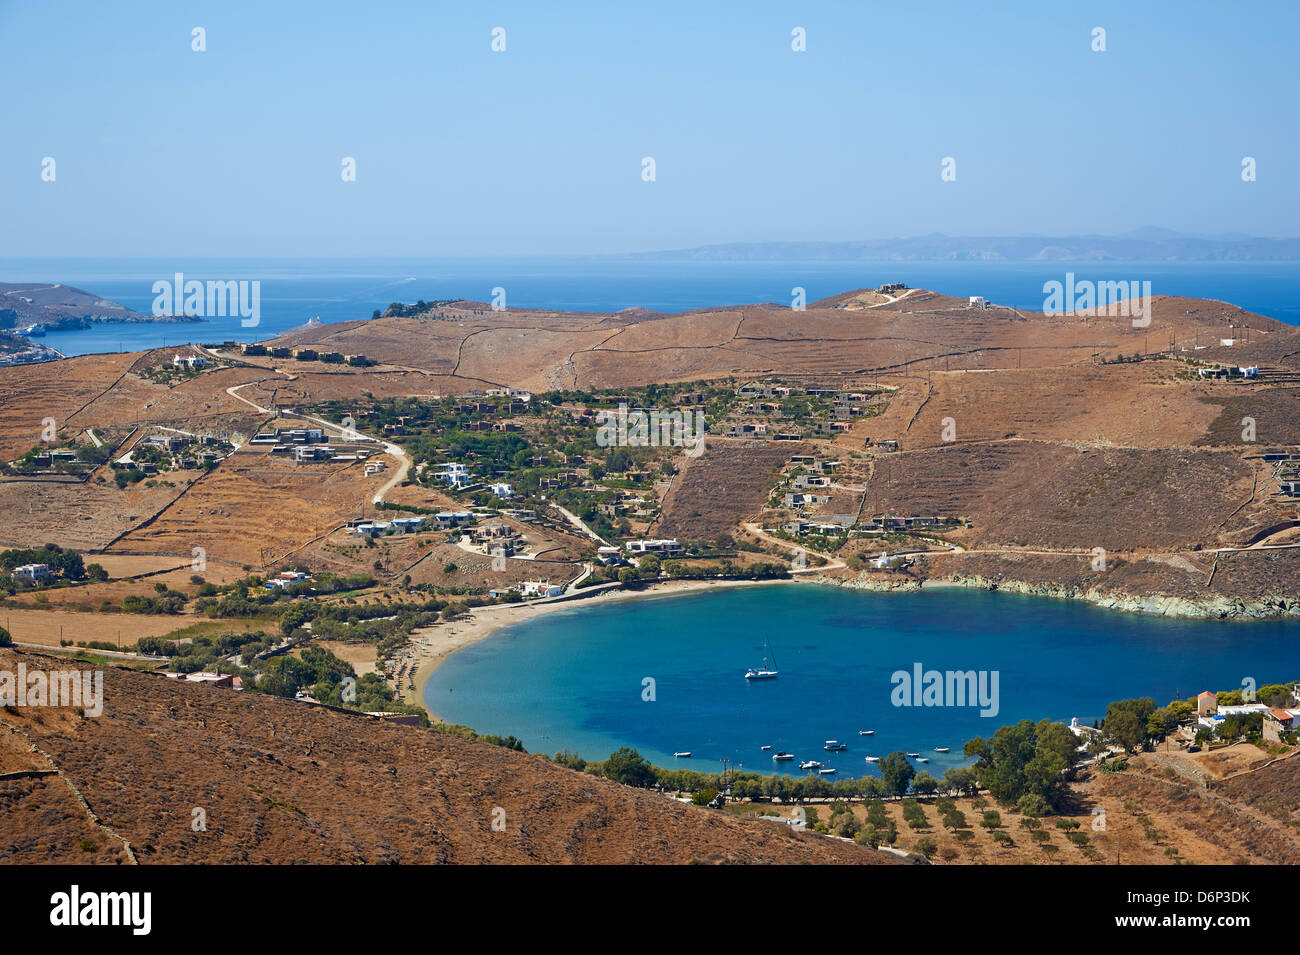 The beach of Otzias, Agios Sostis, Kea Island, Cyclades, Greek Islands, Greece, Europe - Stock Image